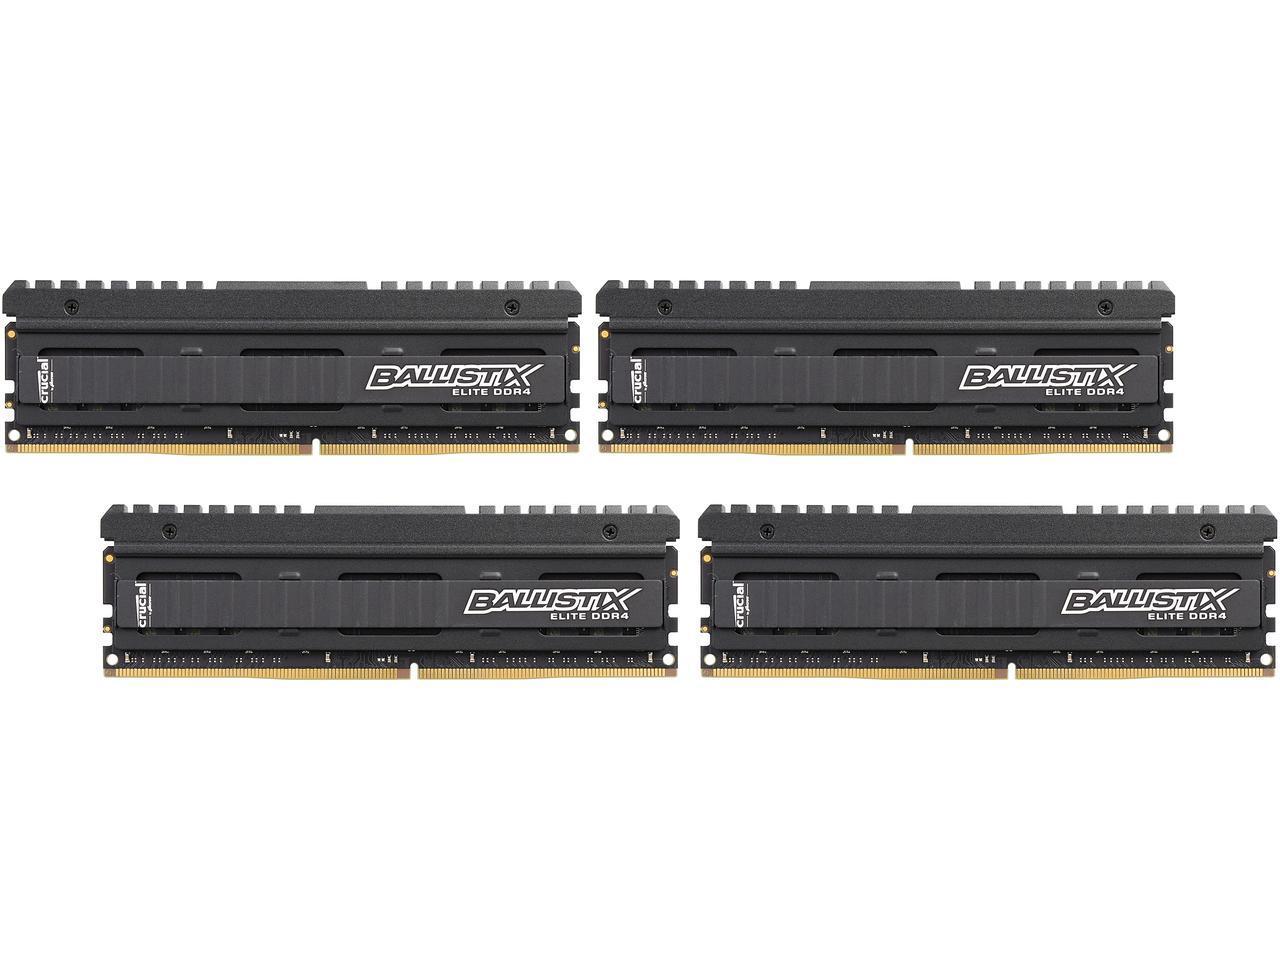 Crucial Ballistix Elite DDR4 3000MHz 32GB RAM Kit-20-156-137-04-jpg